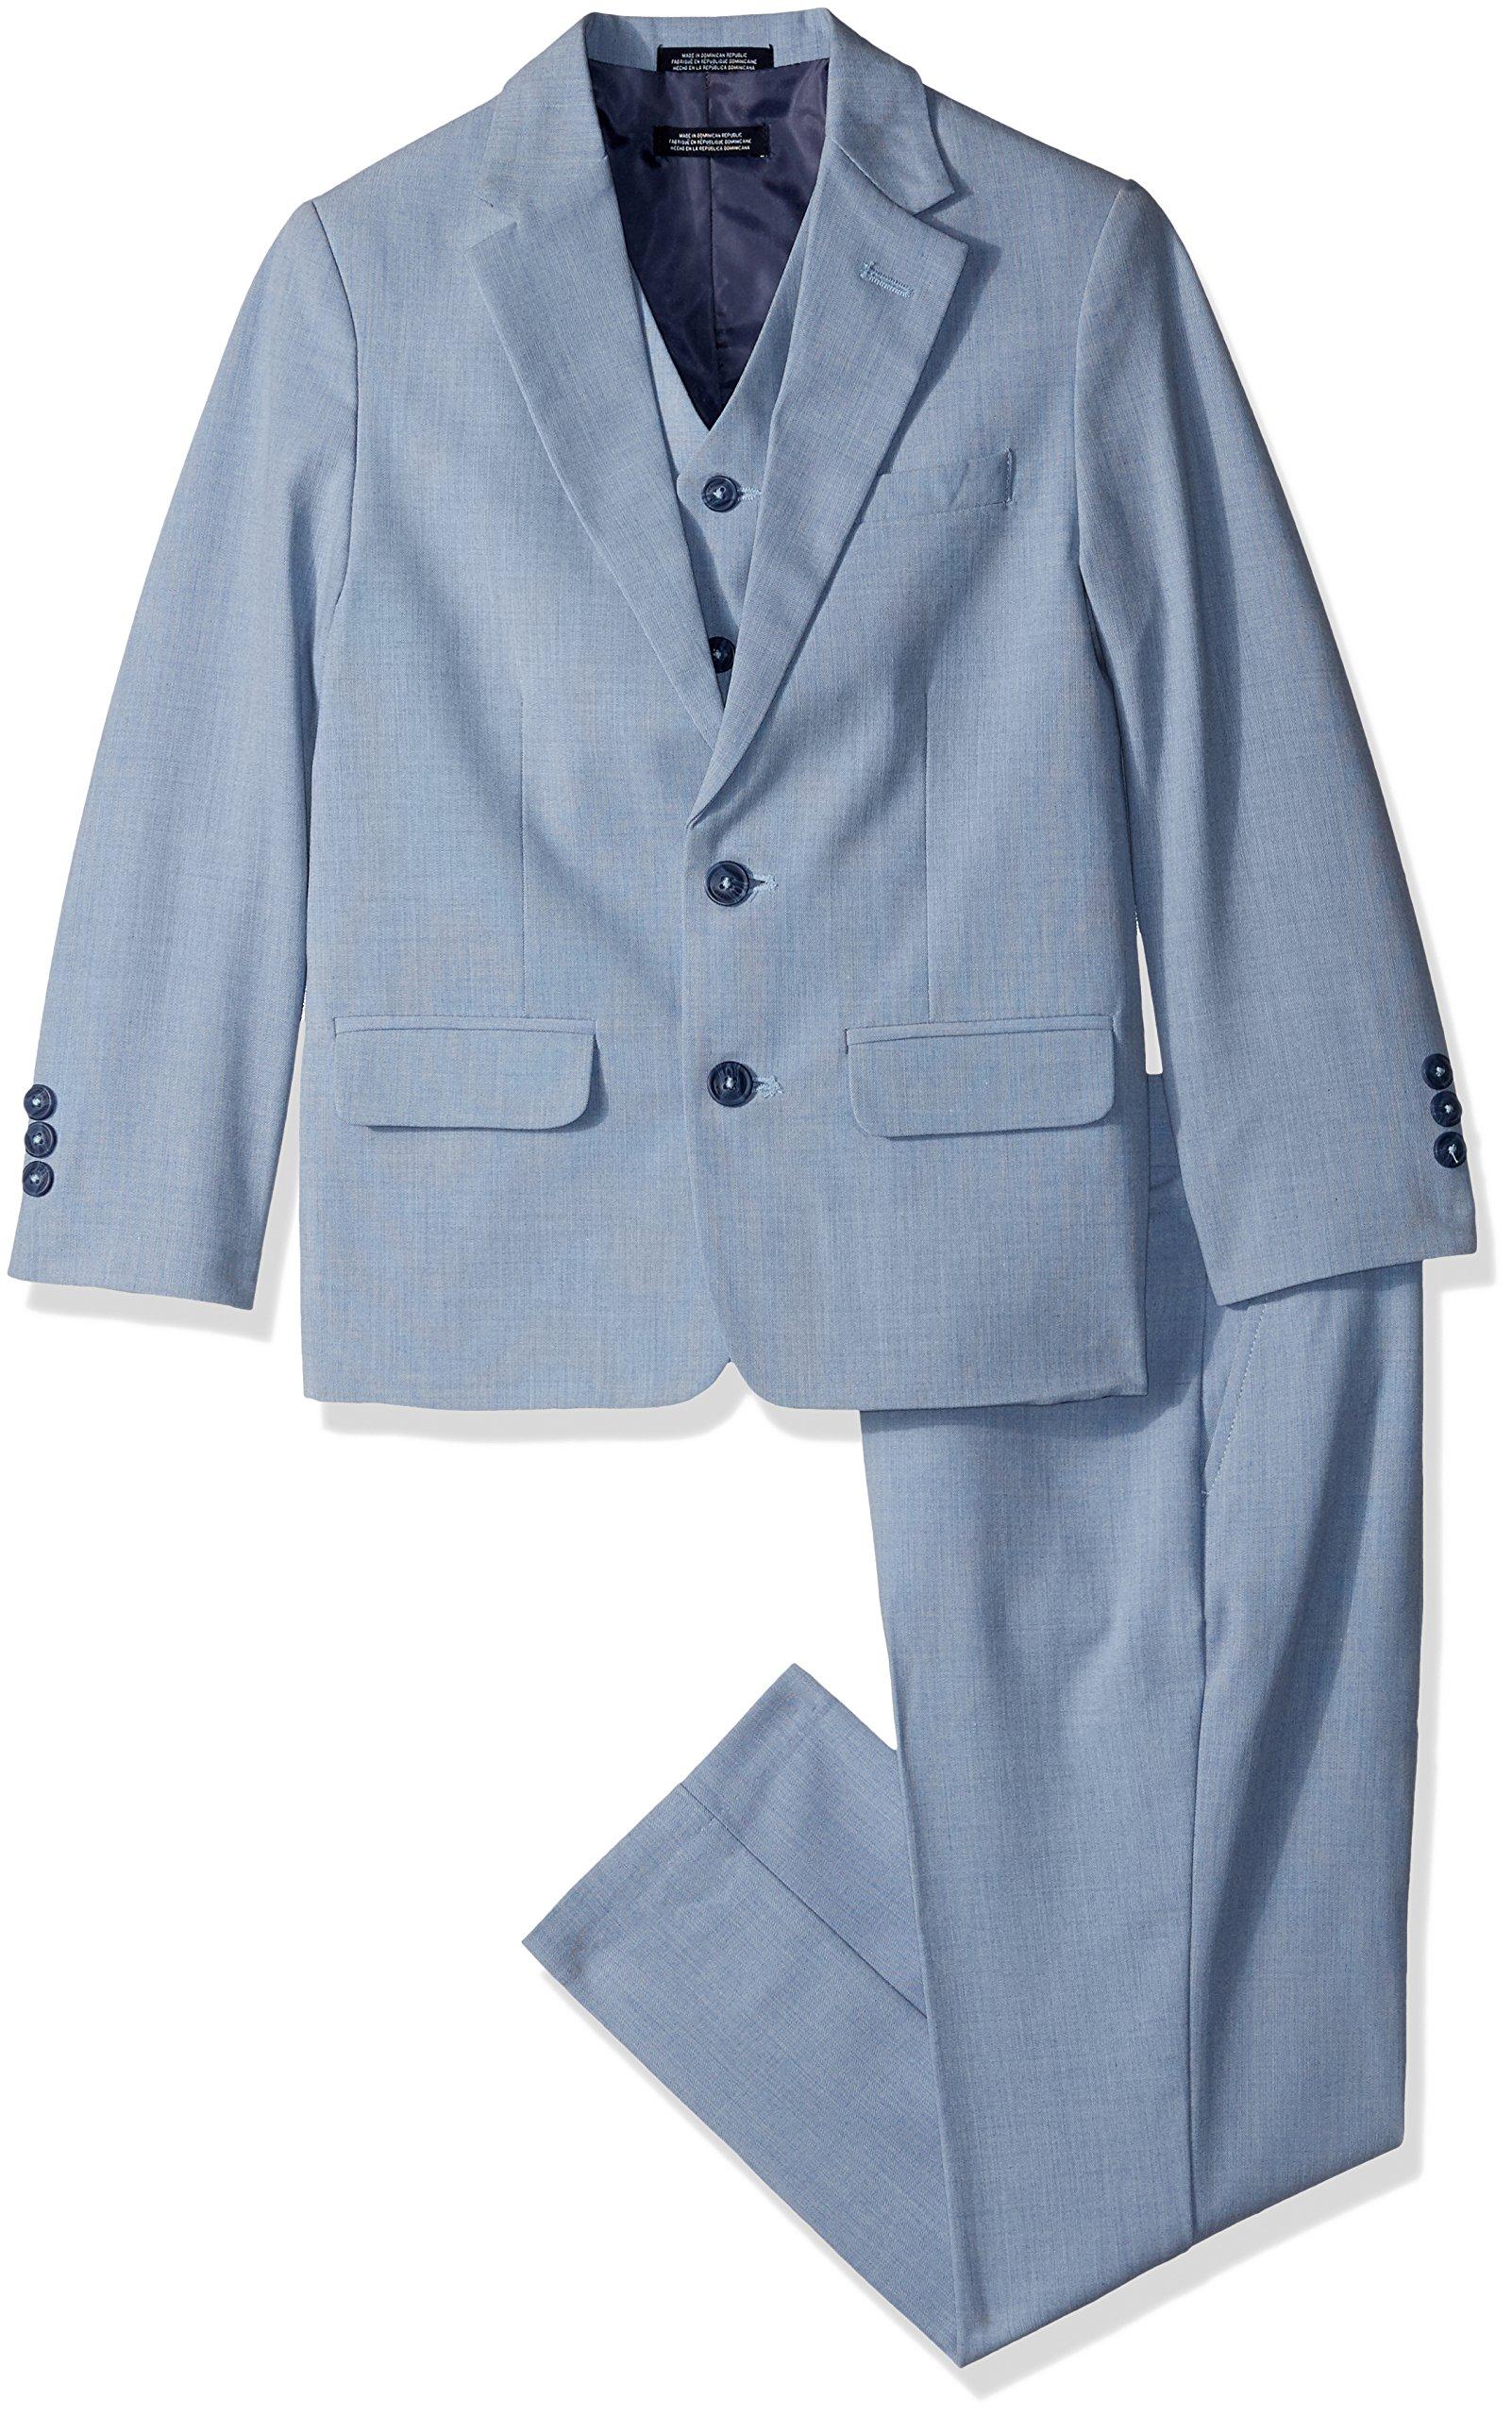 b4e468d3cfe88 Cheap Nautica Suit, find Nautica Suit deals on line at Alibaba.com